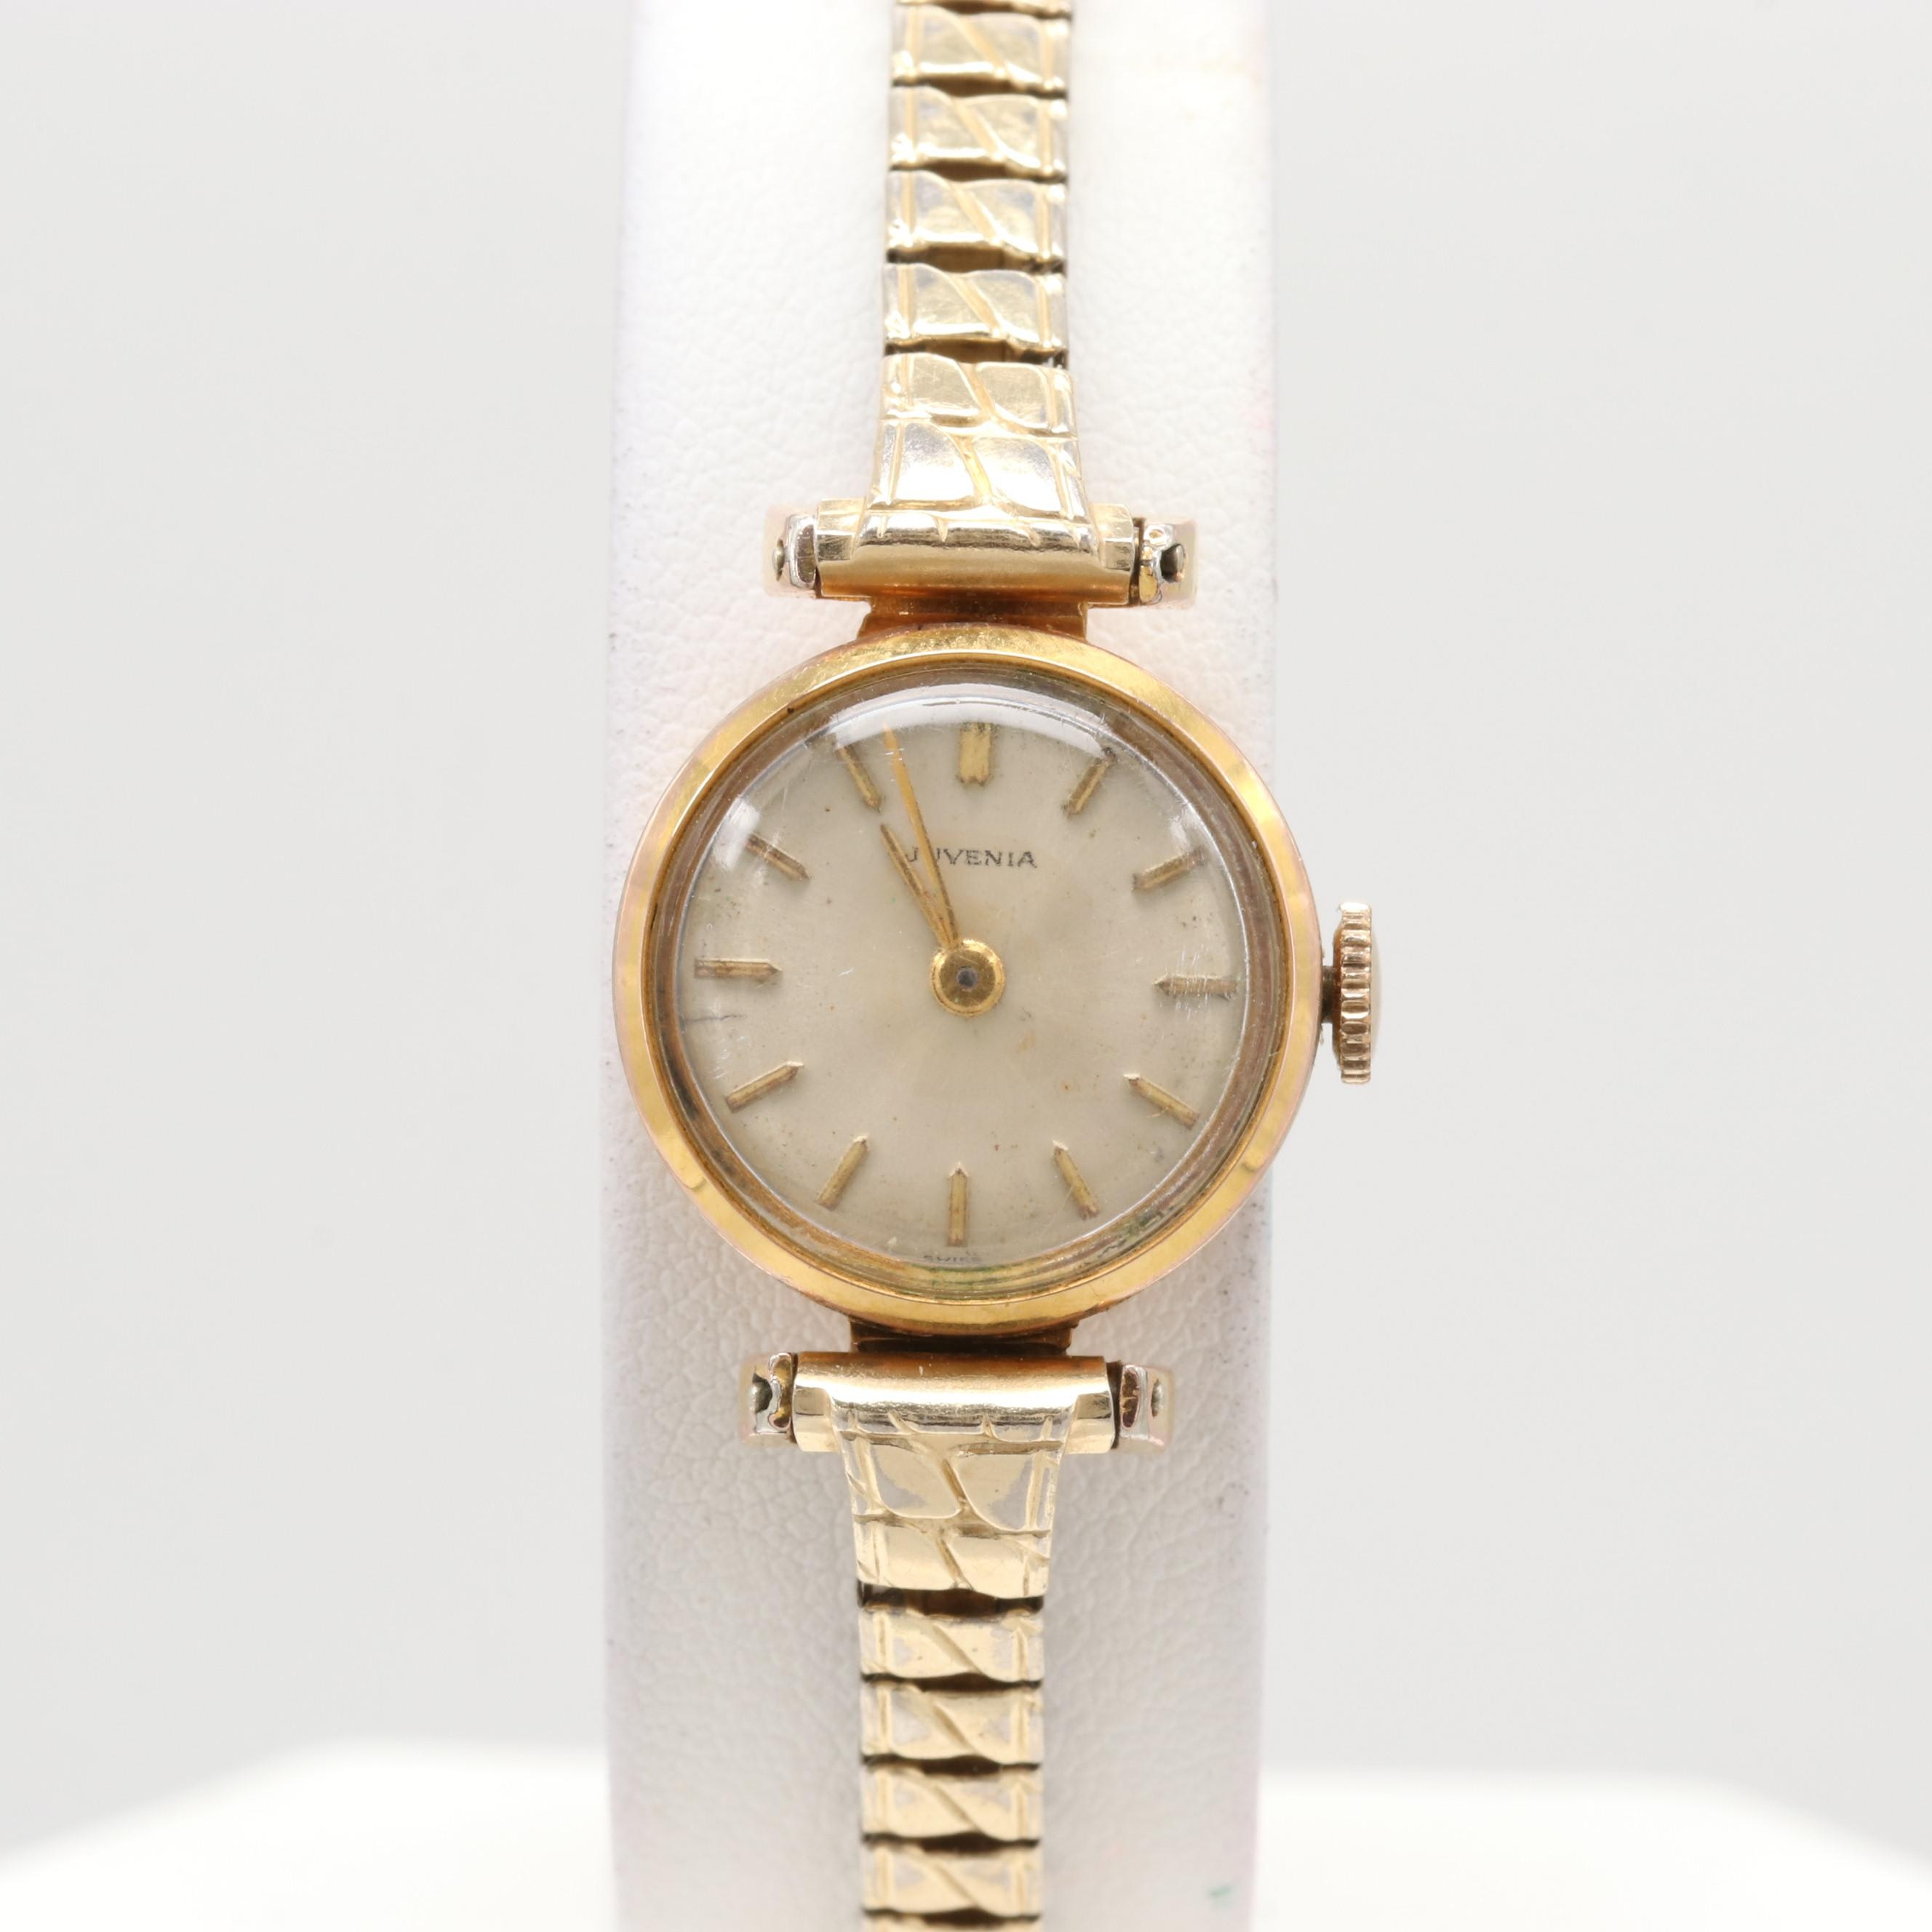 Vintage Juvenia Stem Wind Wristwatch